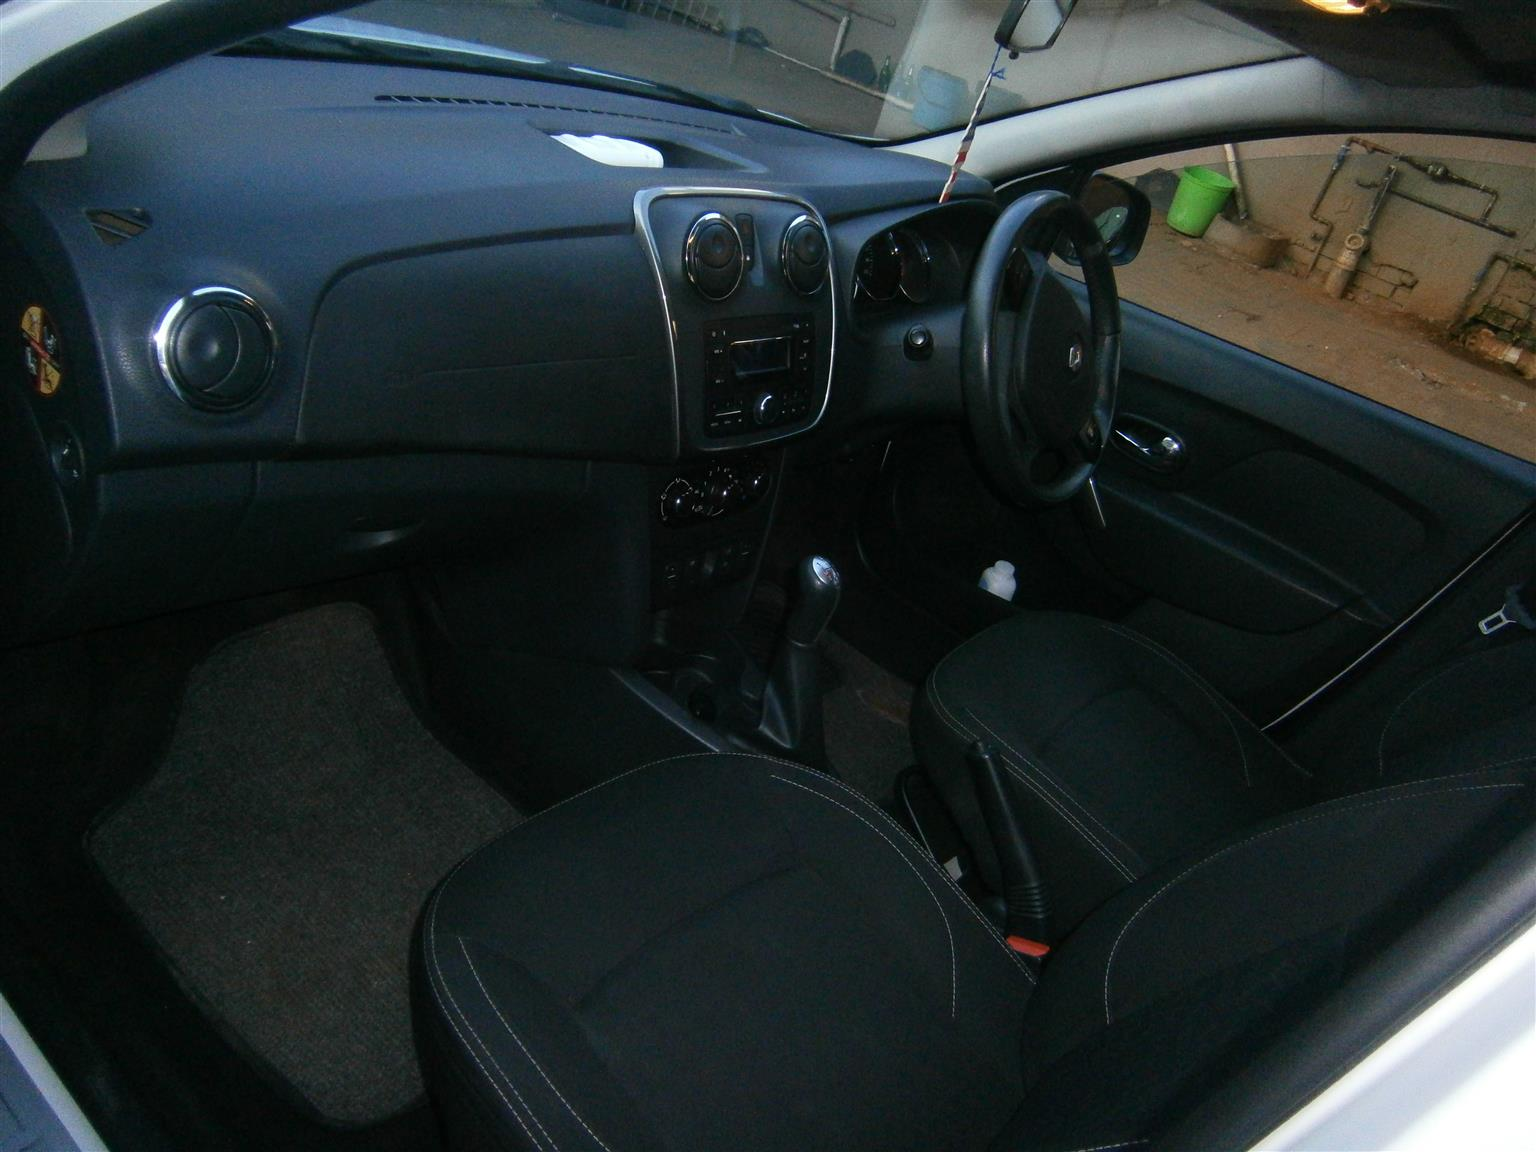 2014 Renault Sandero 66kW turbo Dynamique